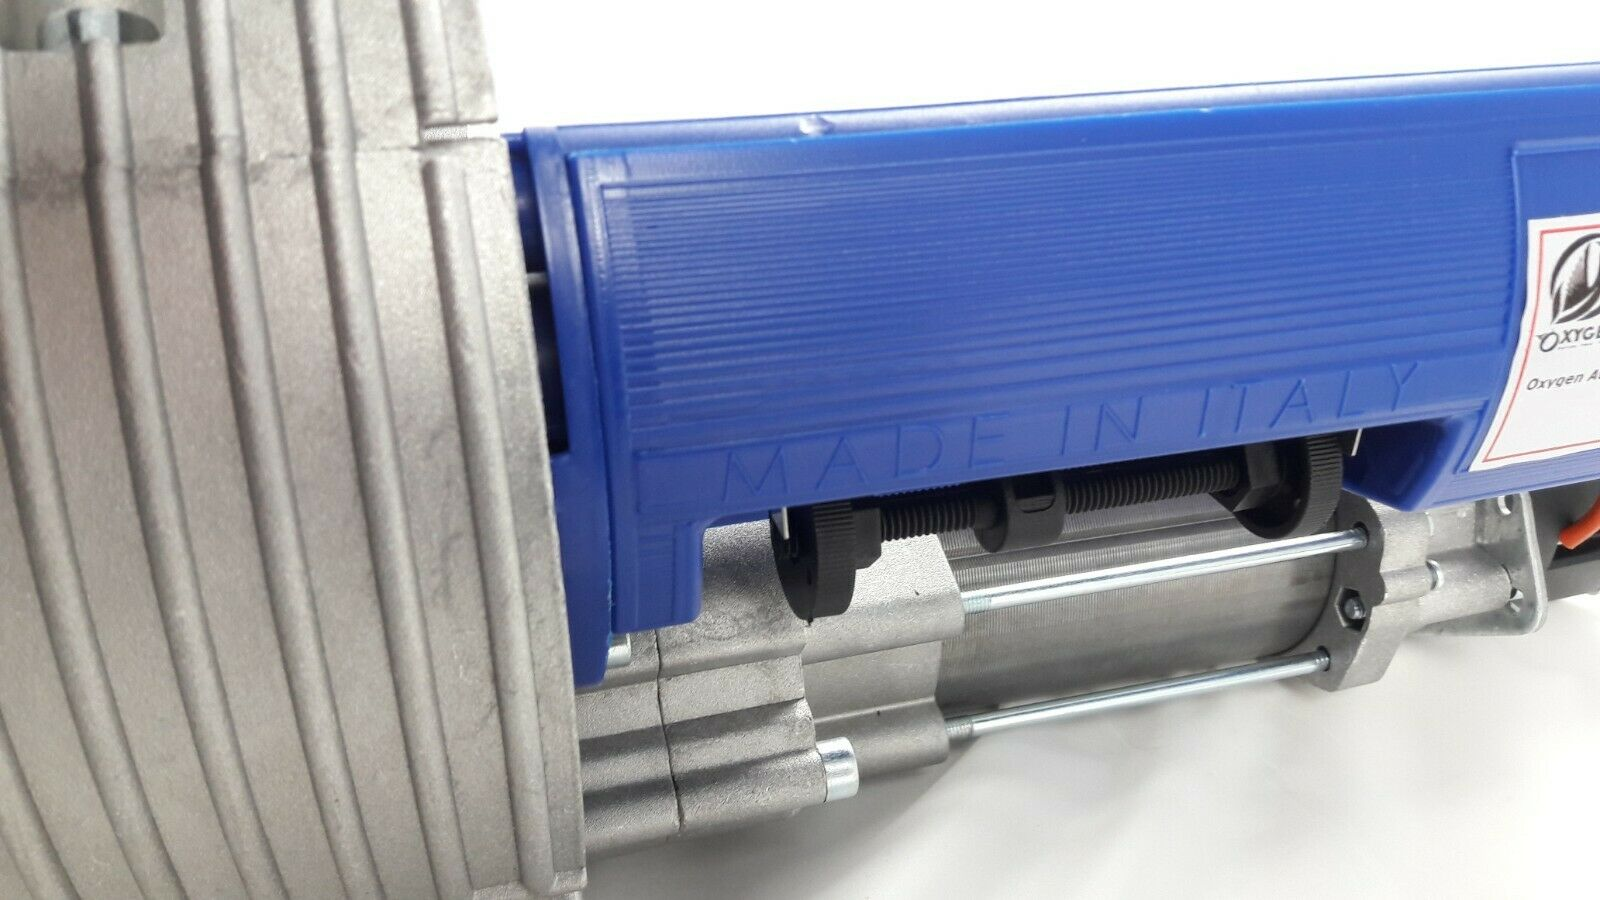 Kit automazione motore per serranda 230V BFT PUJOL ACM 180kg asse 48 60 Freno